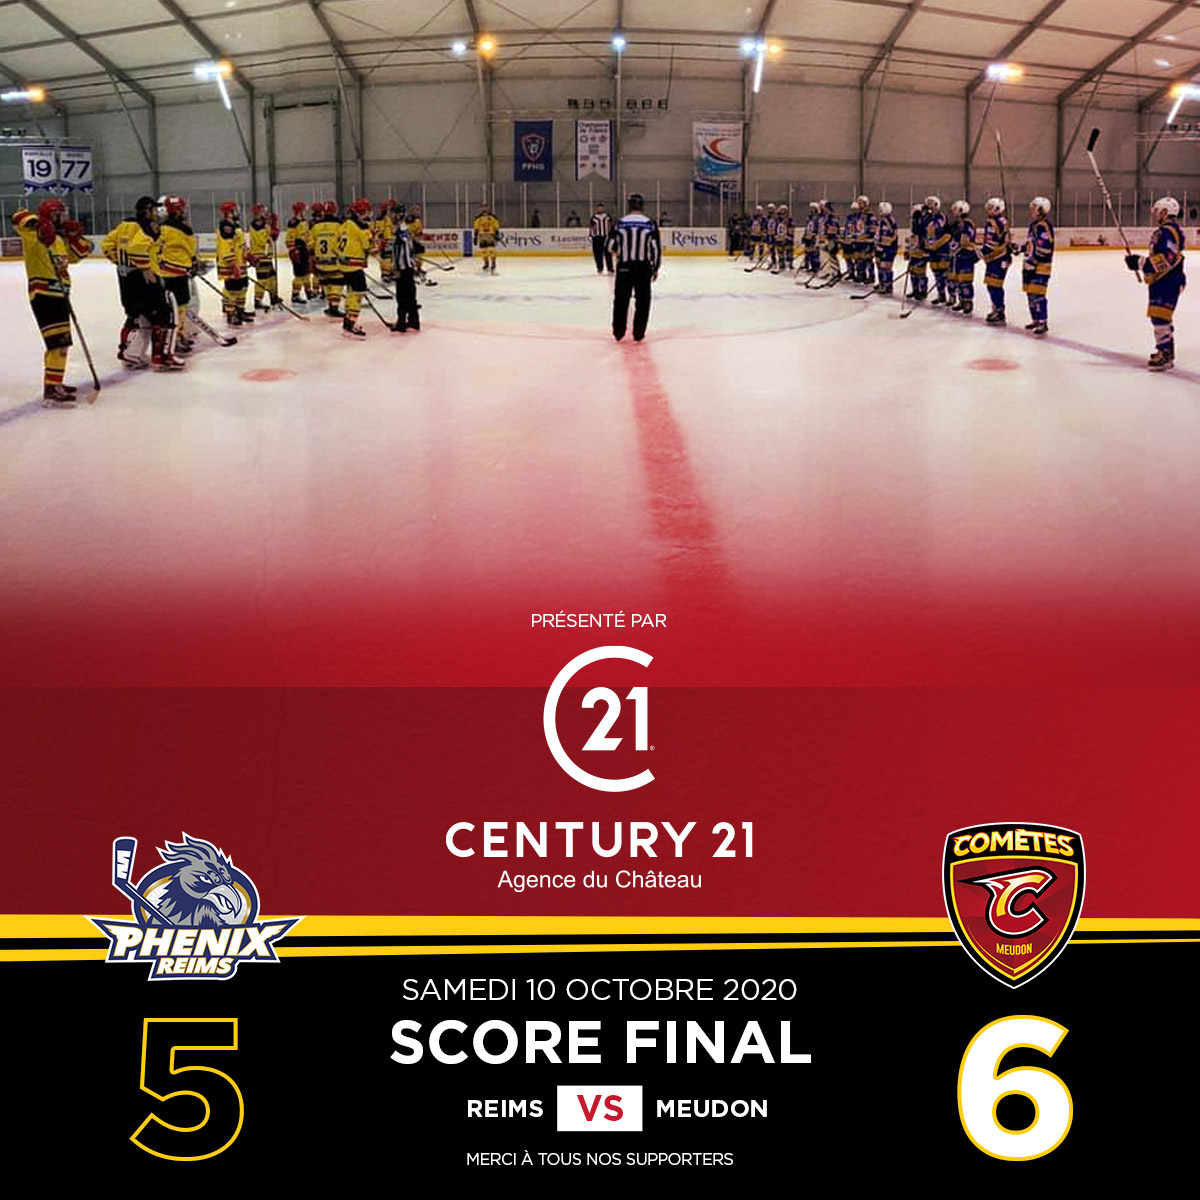 MHC2020 Score Match2 Reims Vs